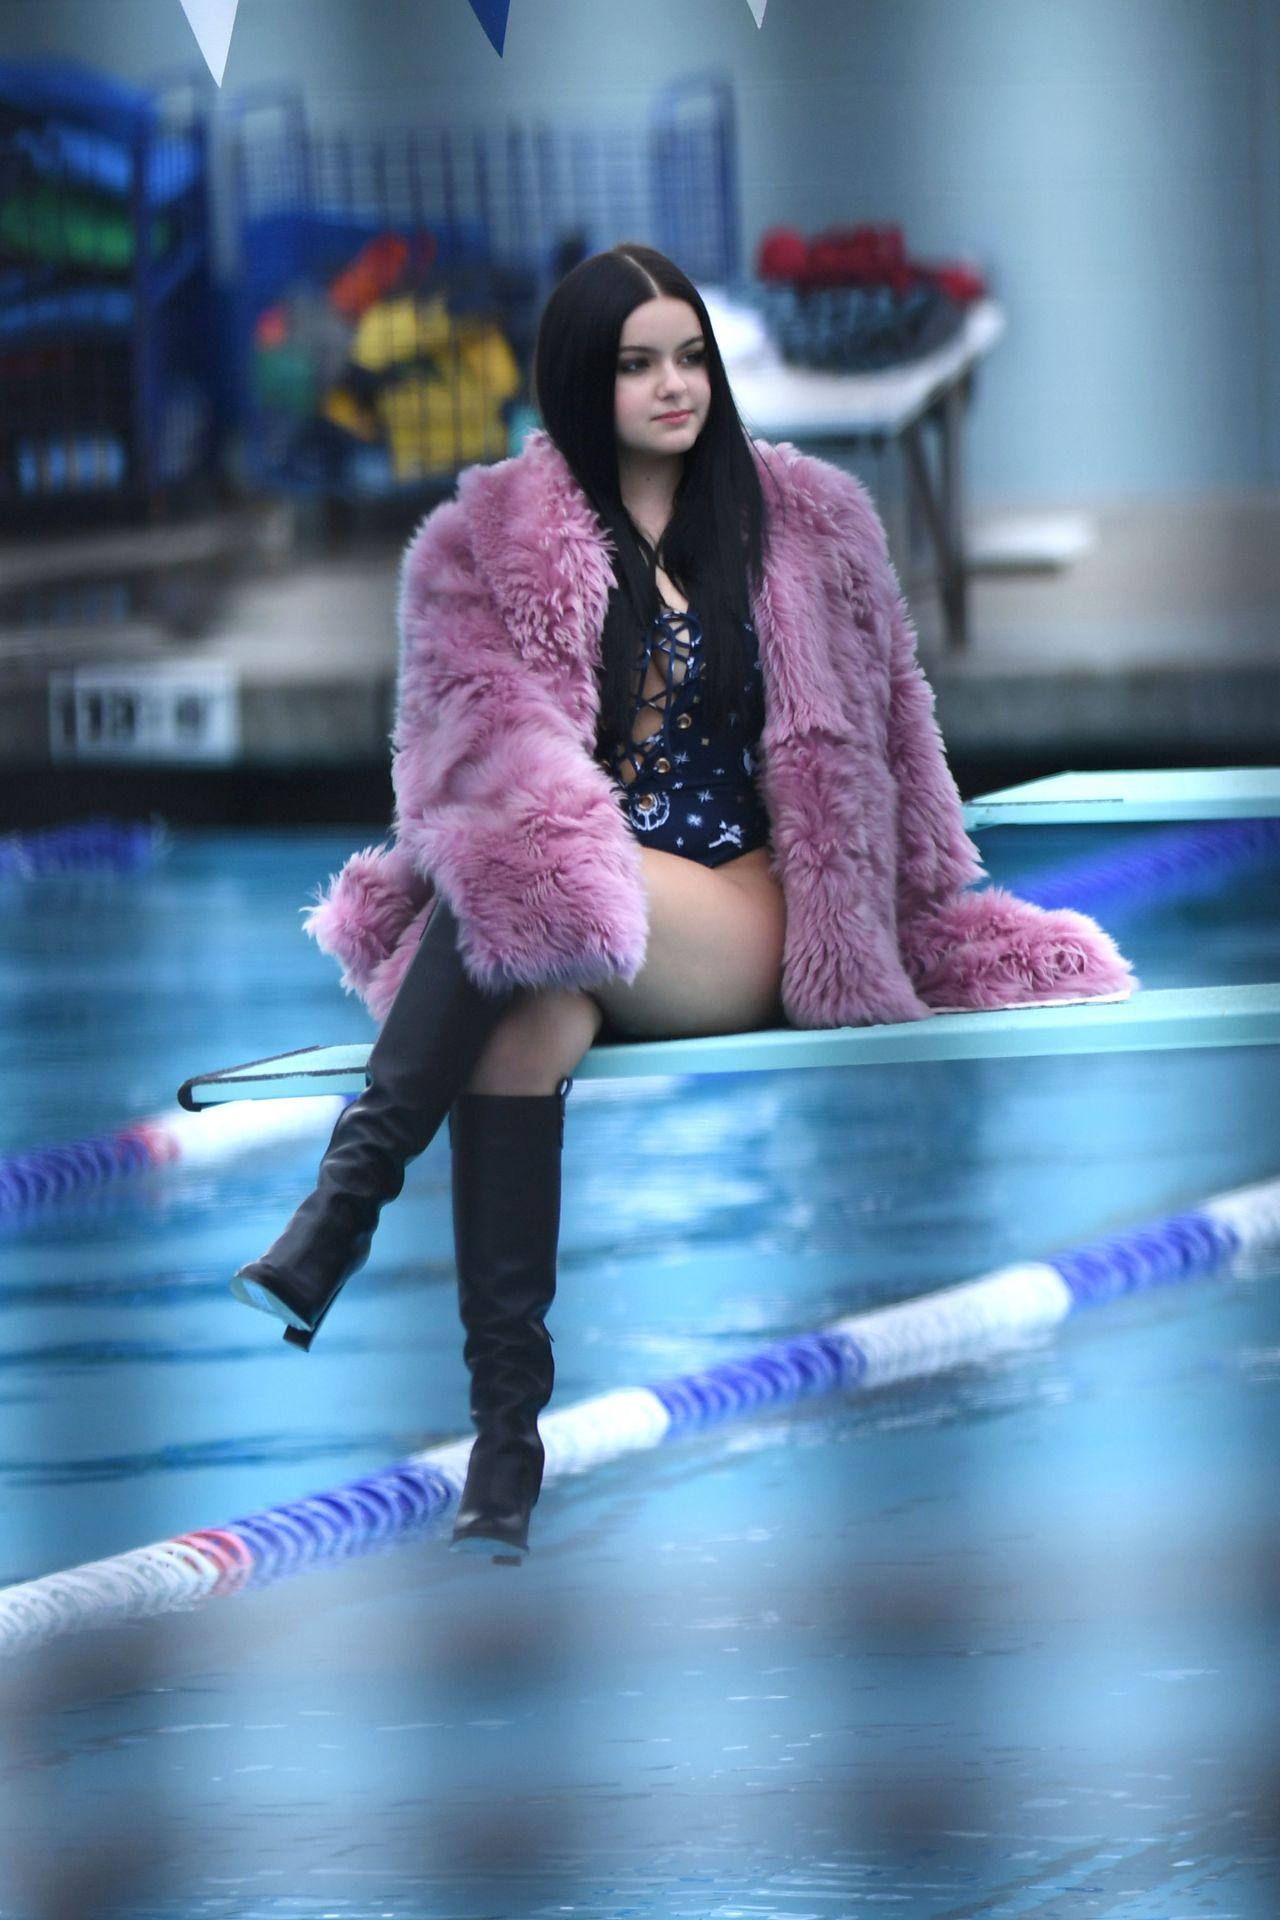 Ariel Winter  Photoshoot in Los Angeles 1029 2016